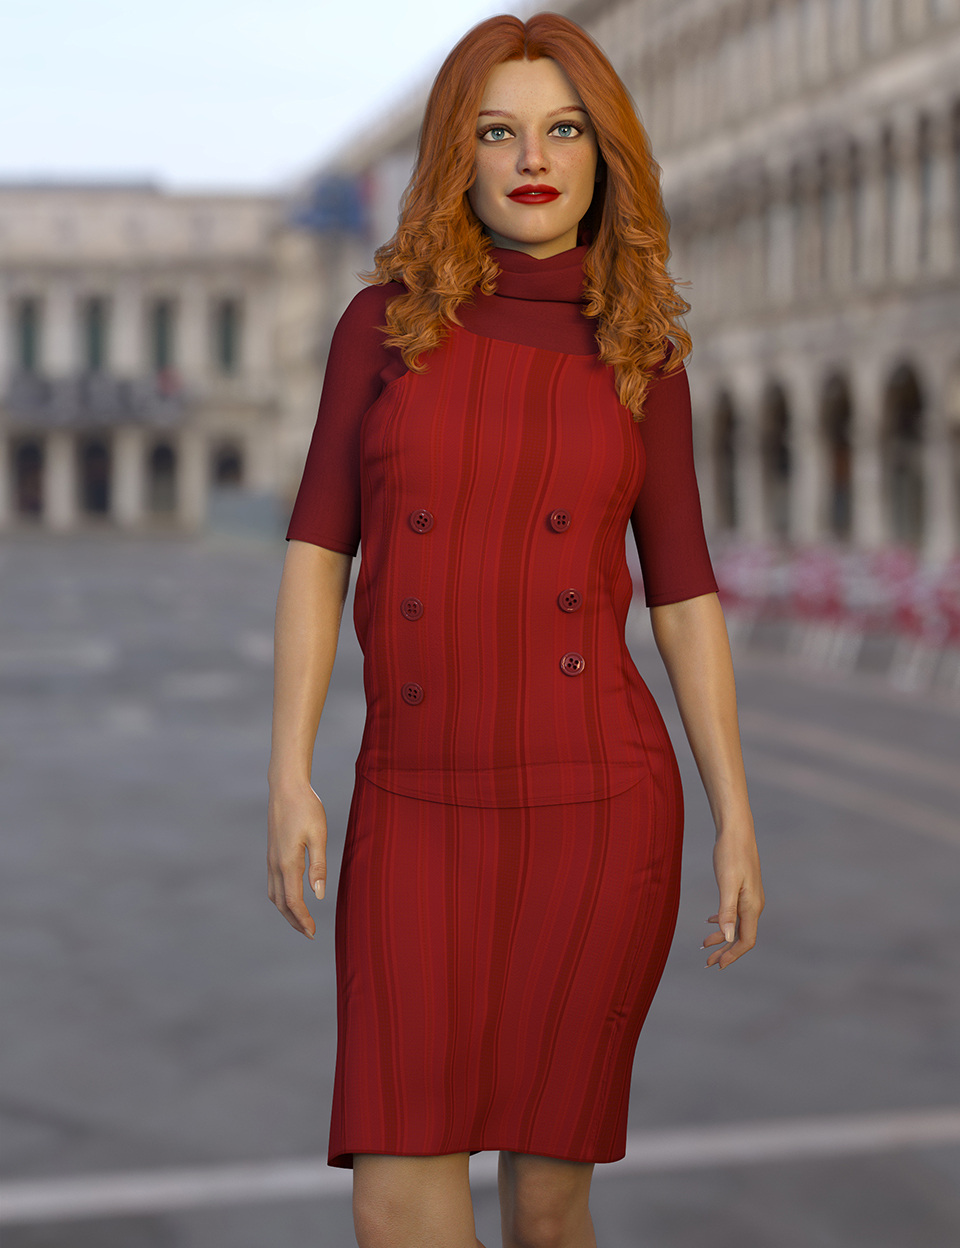 dForce Azul Outfit for Genesis 8 Females by: Nelmi, 3D Models by Daz 3D